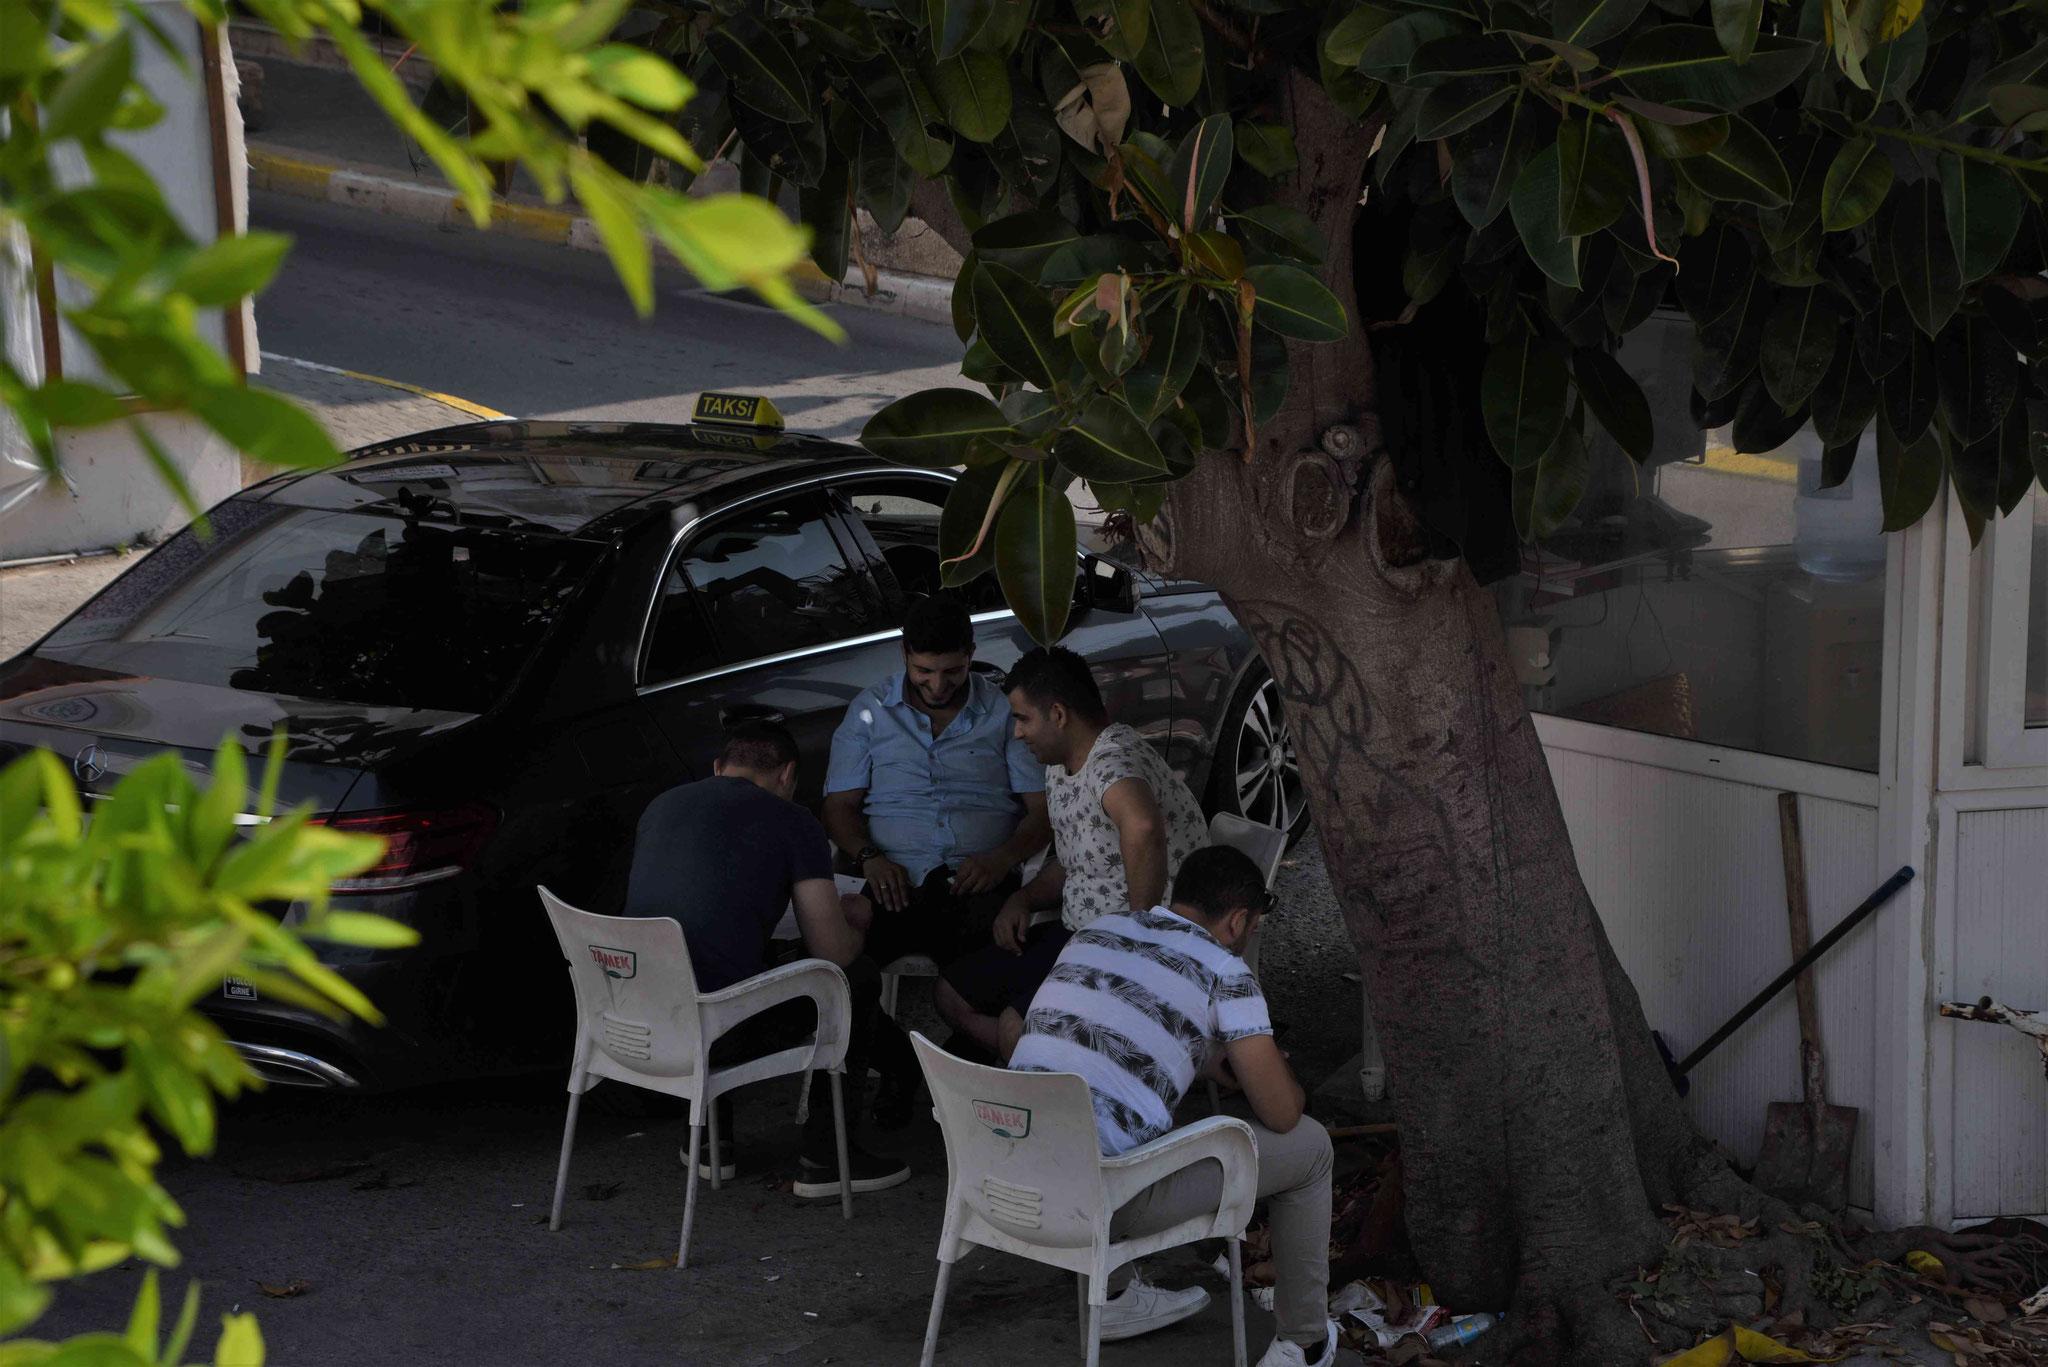 Pausenplatz der Taxifahrer